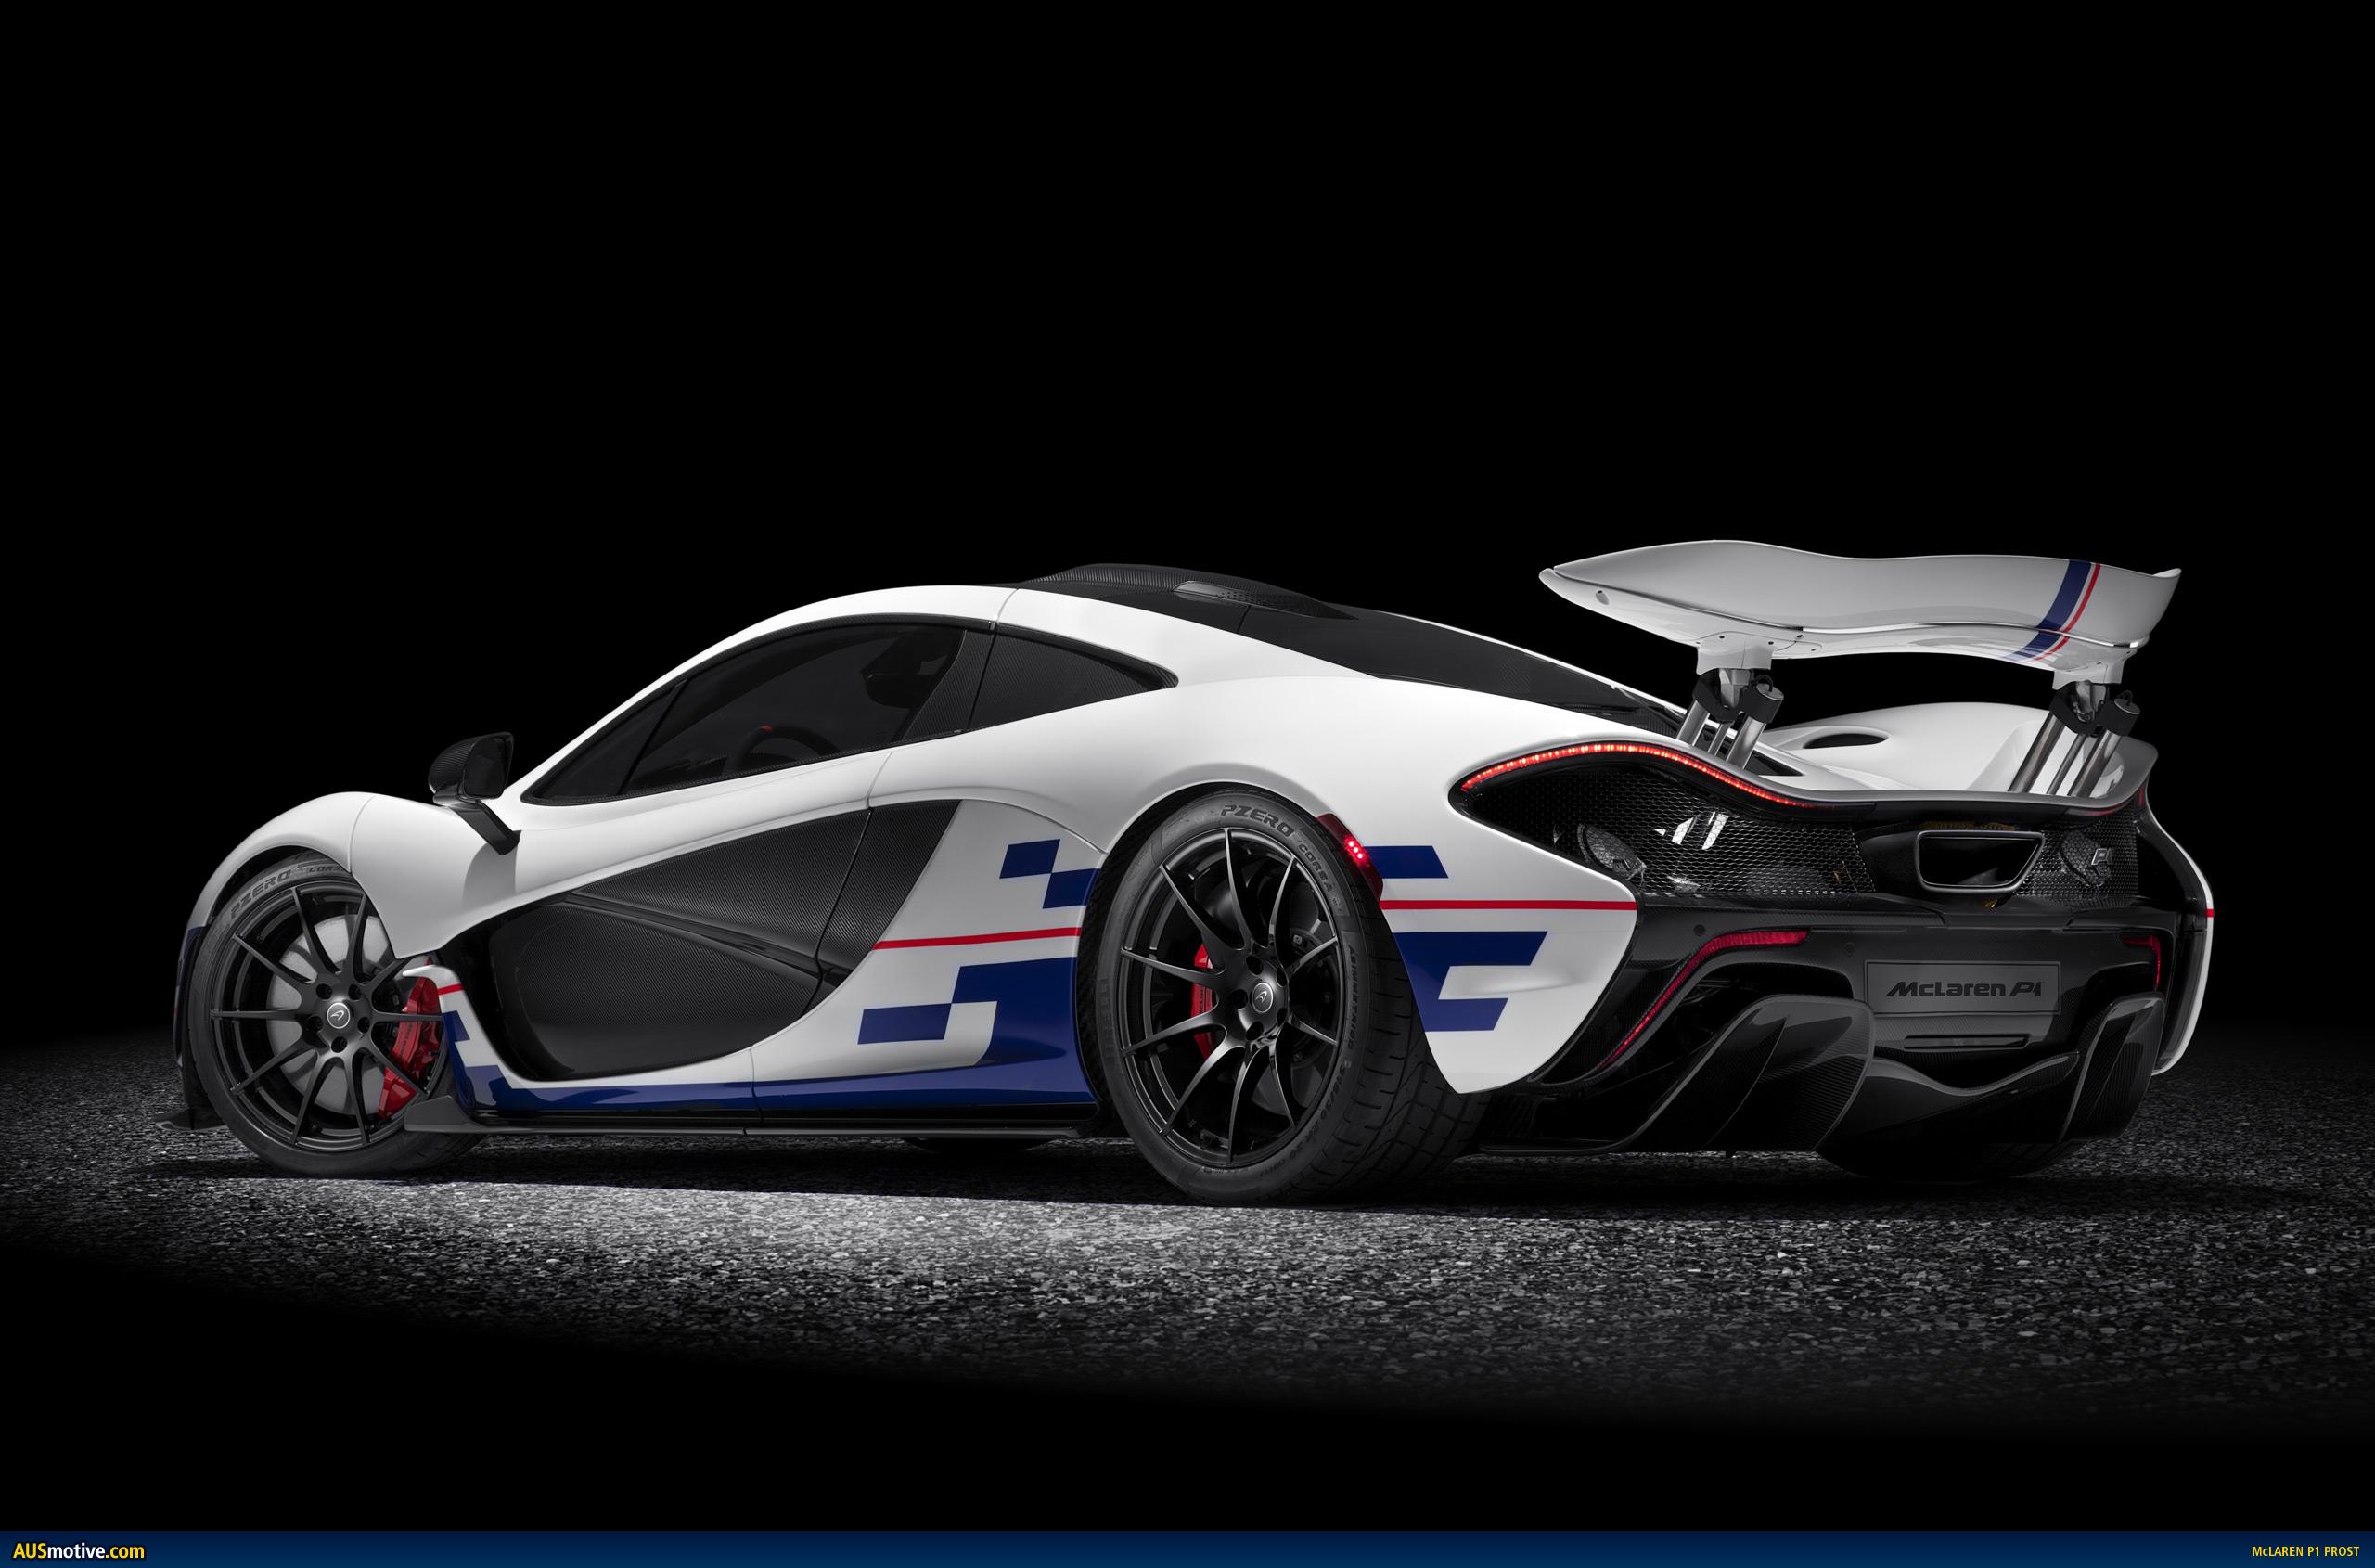 http://www.ausmotive.com/pics/2015/McLaren-P1-Prost-02.jpg